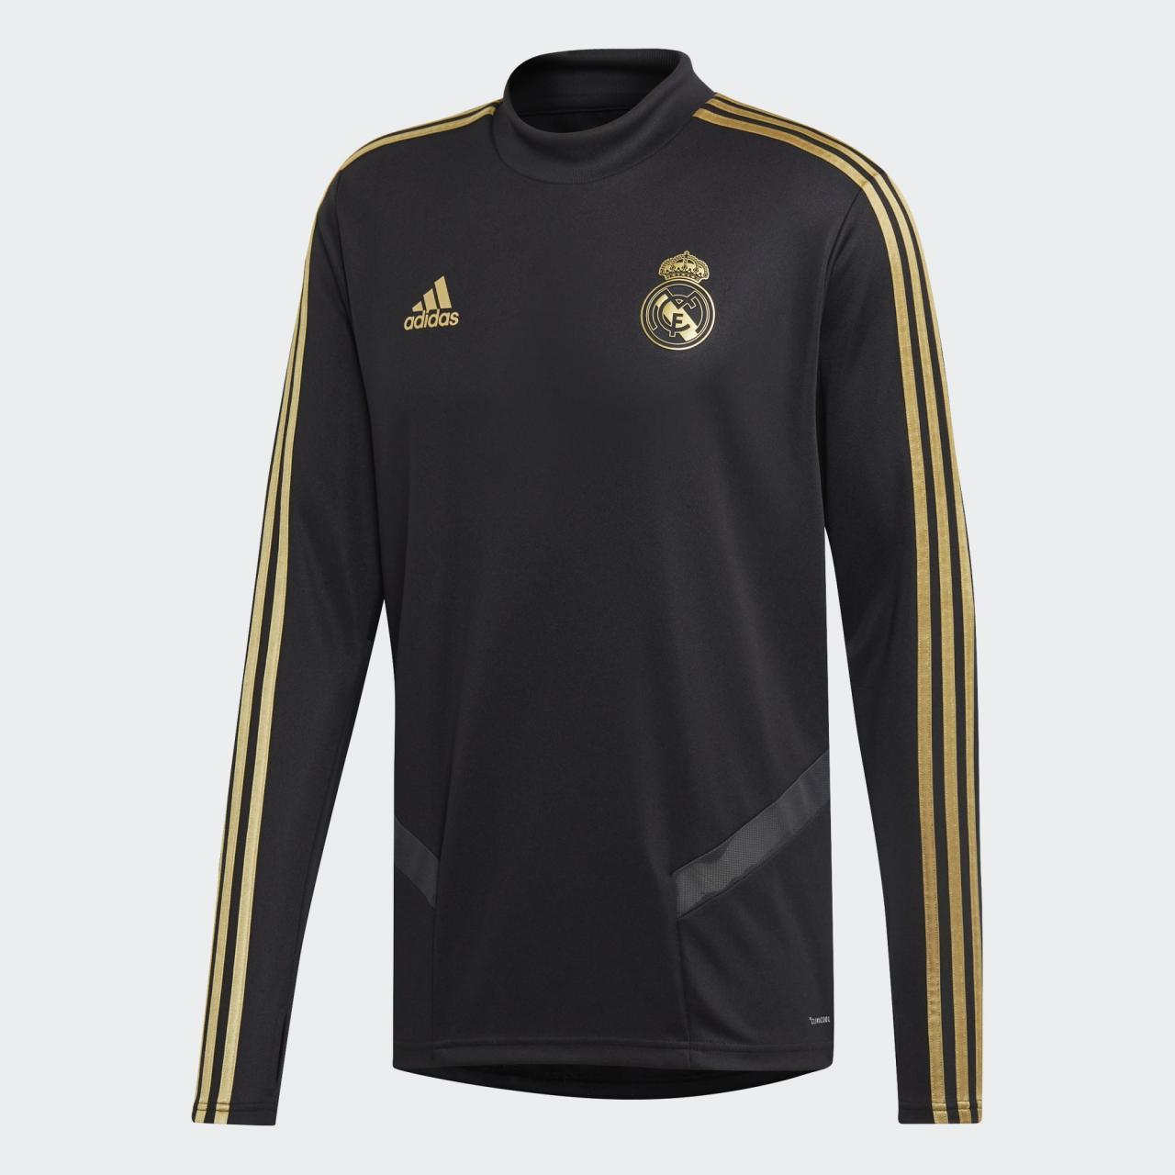 شلوار و گرمکن تیم فوتبال رئال مادرید